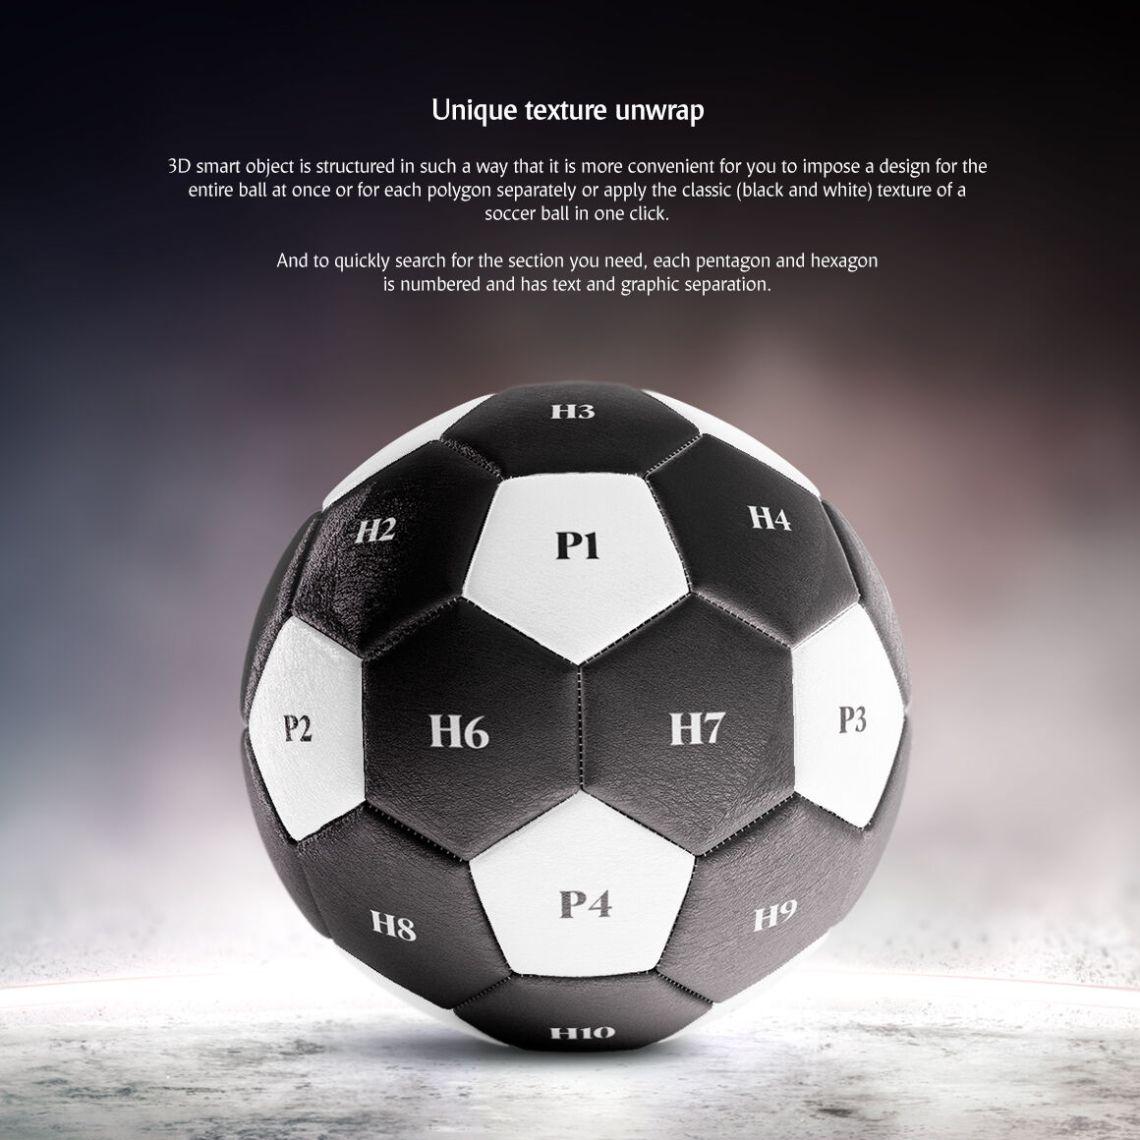 Download American Football Kit Mockup Psd Free Psd All Mockups Template Design Assets Free Mockups